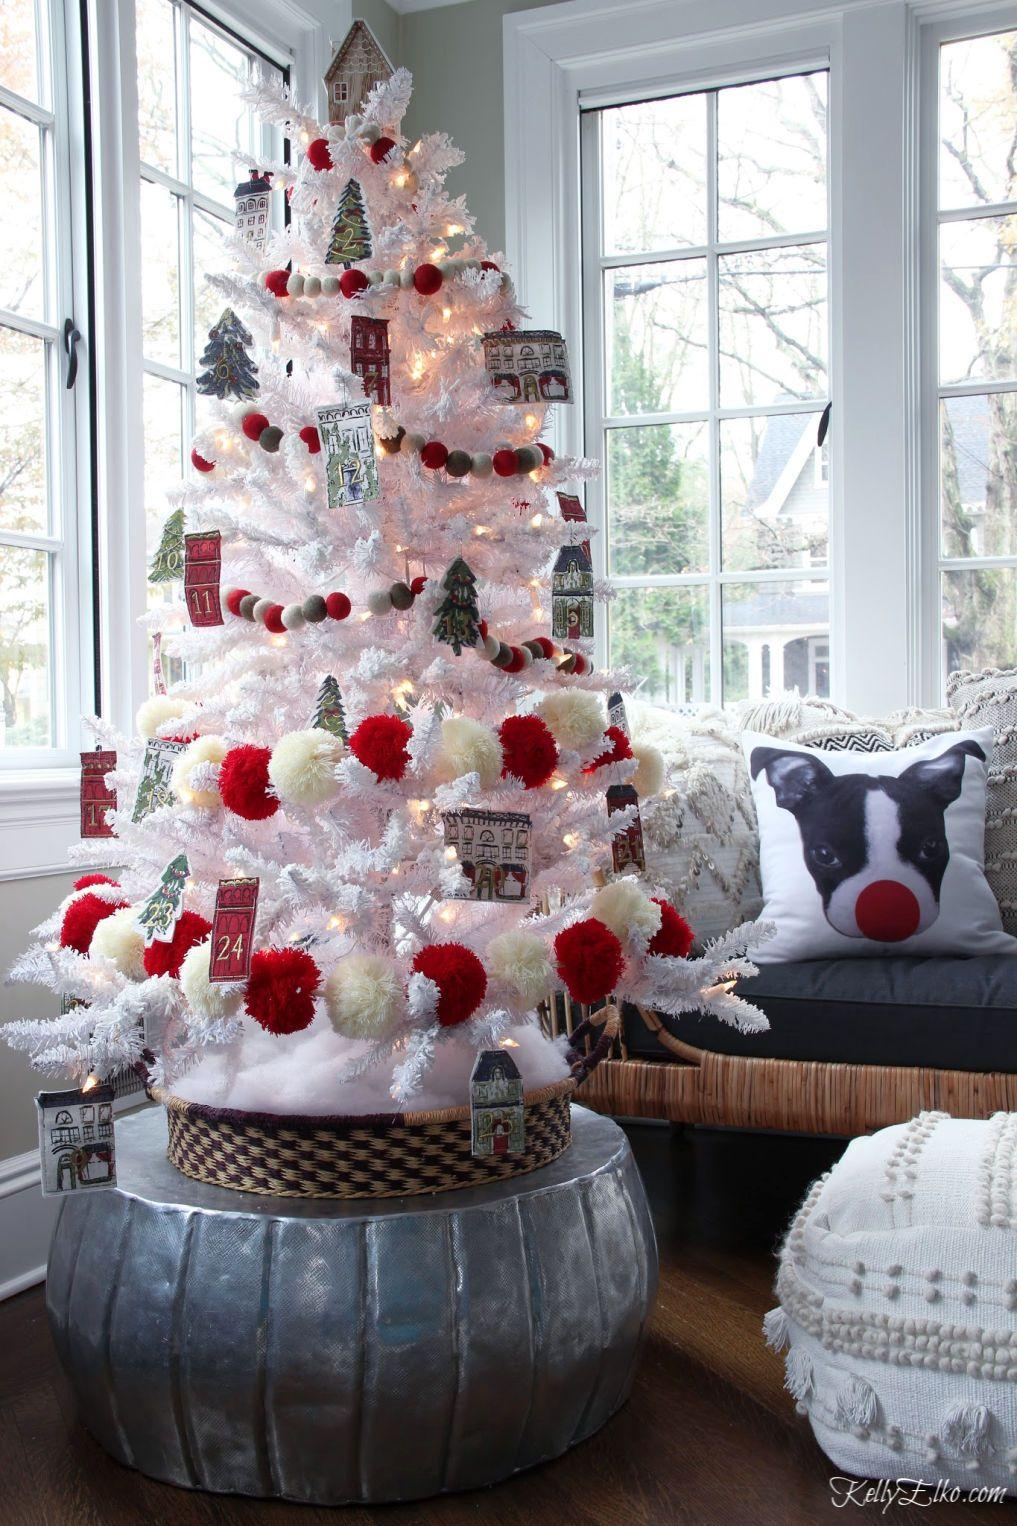 How cute is this Advent calendar Christmas tree to countdown to Christmas kellyelko.com #christmas #christmasdecor #christmastree #diychristmasdecor #adventcalendar #whitechristmastree #flockedchristmastree #redchristmas #pompoms #christmasgarland